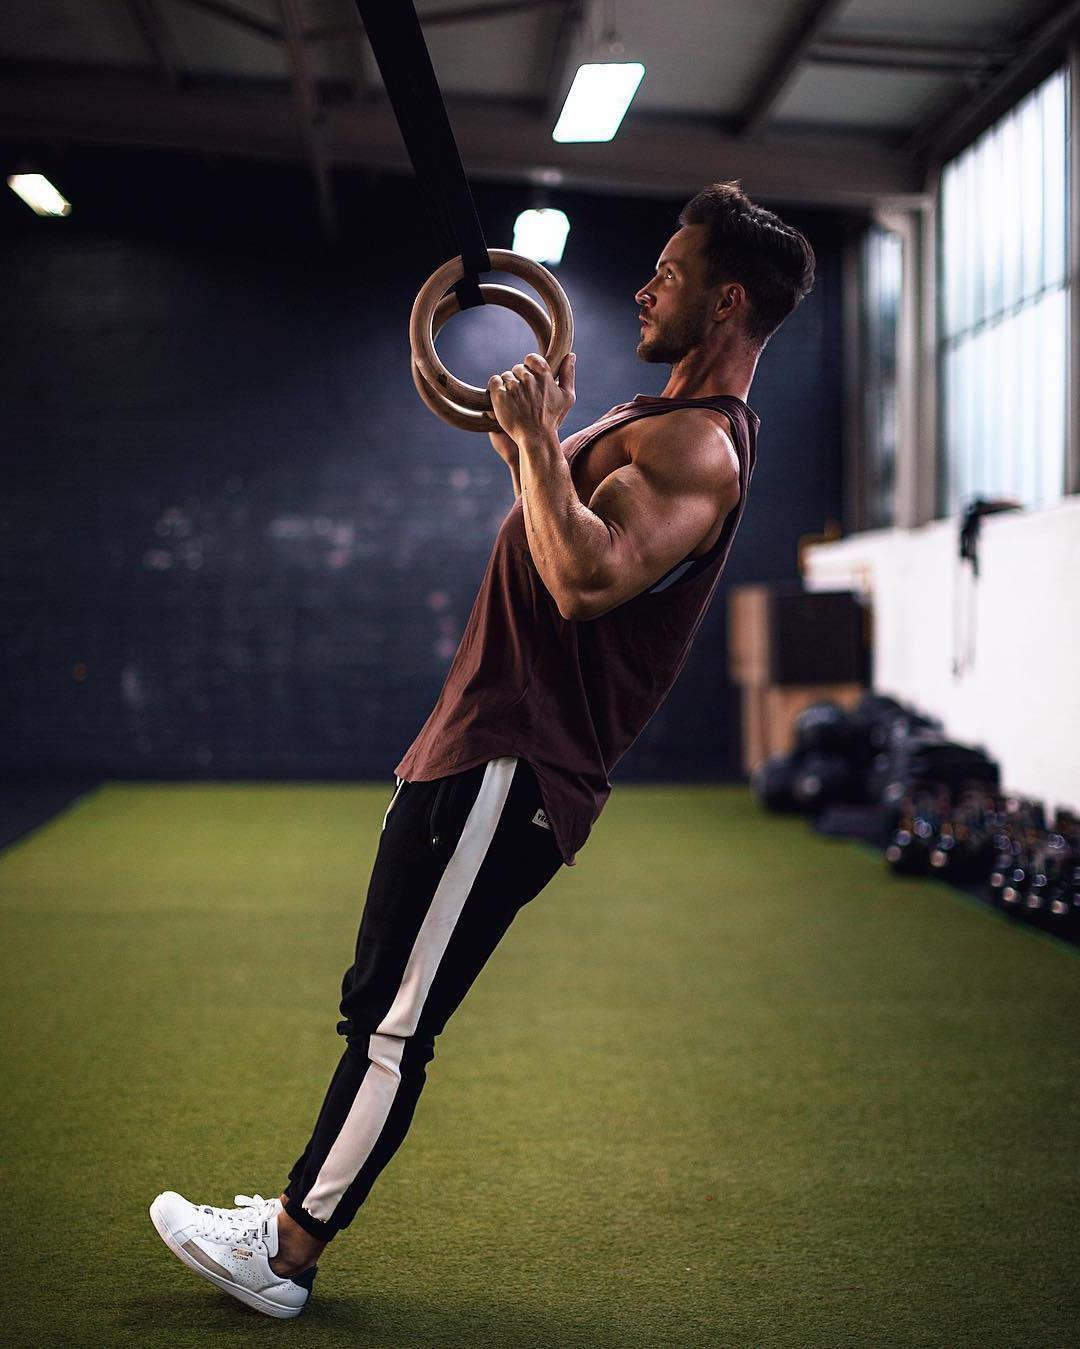 strong-hot-guys-training-biceps-gym